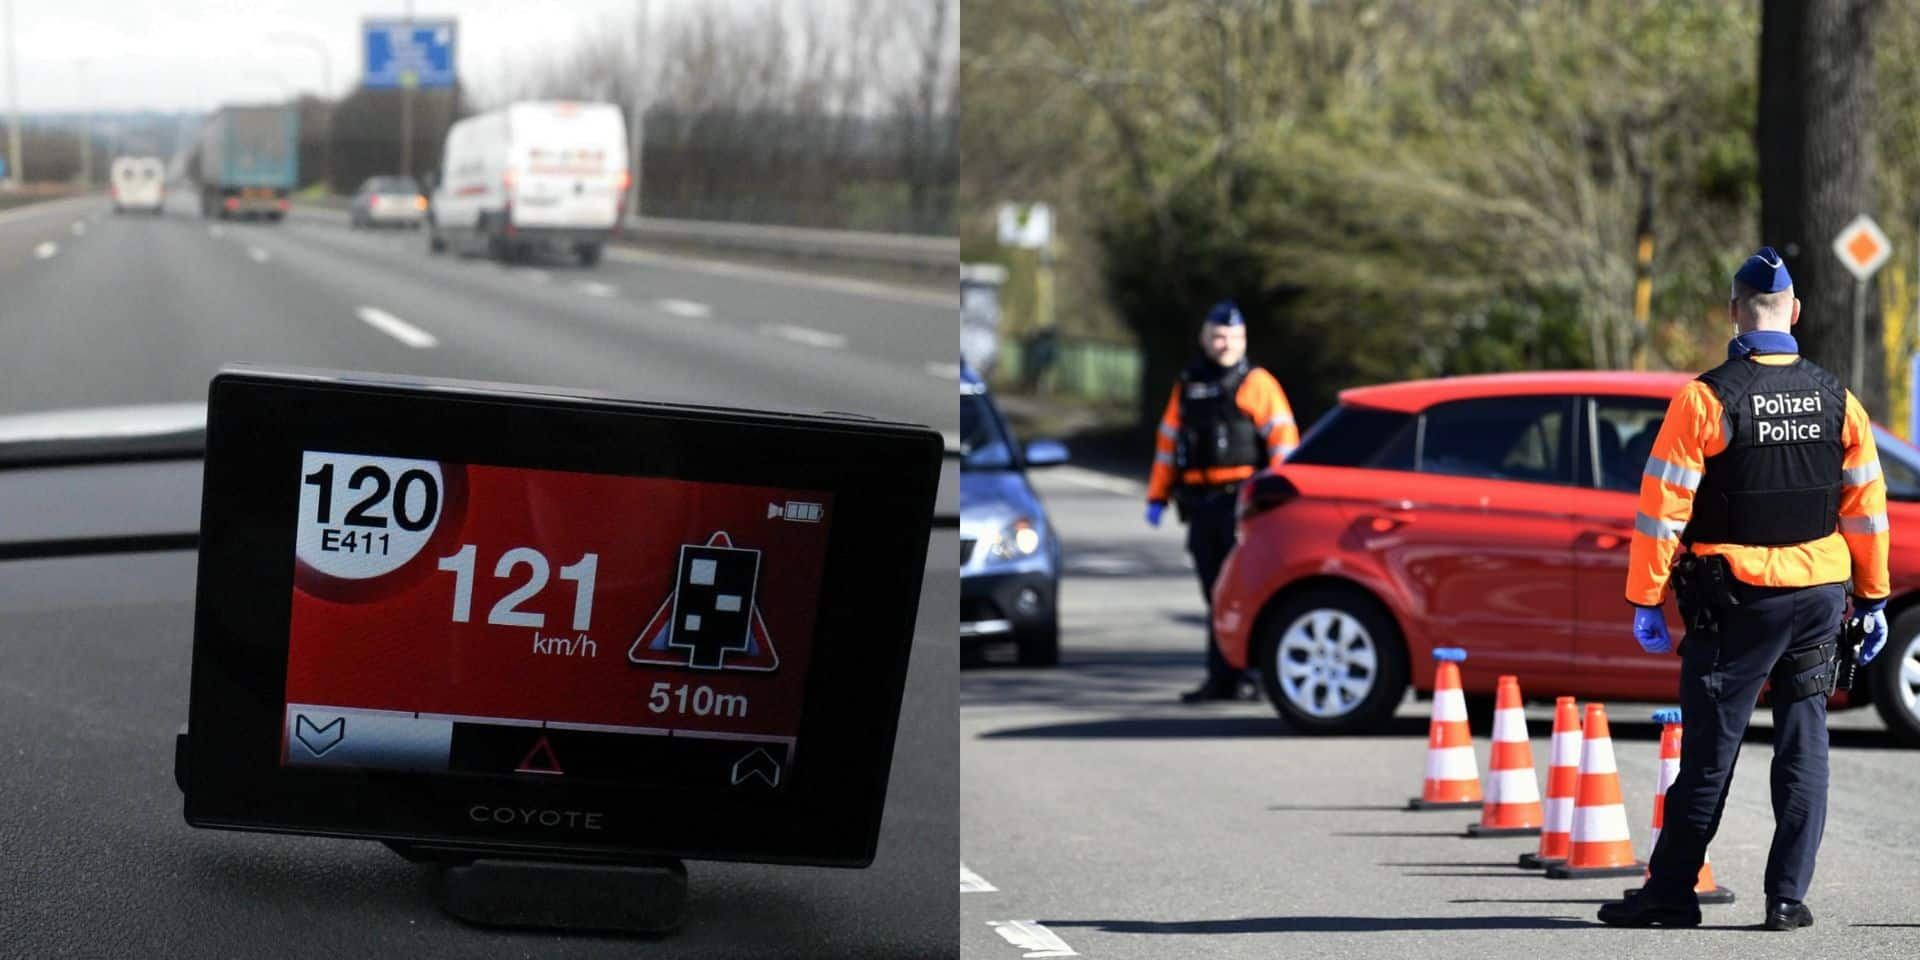 Signaler les contrôles de police sera bientôt interdit en France: quid en Belgique?